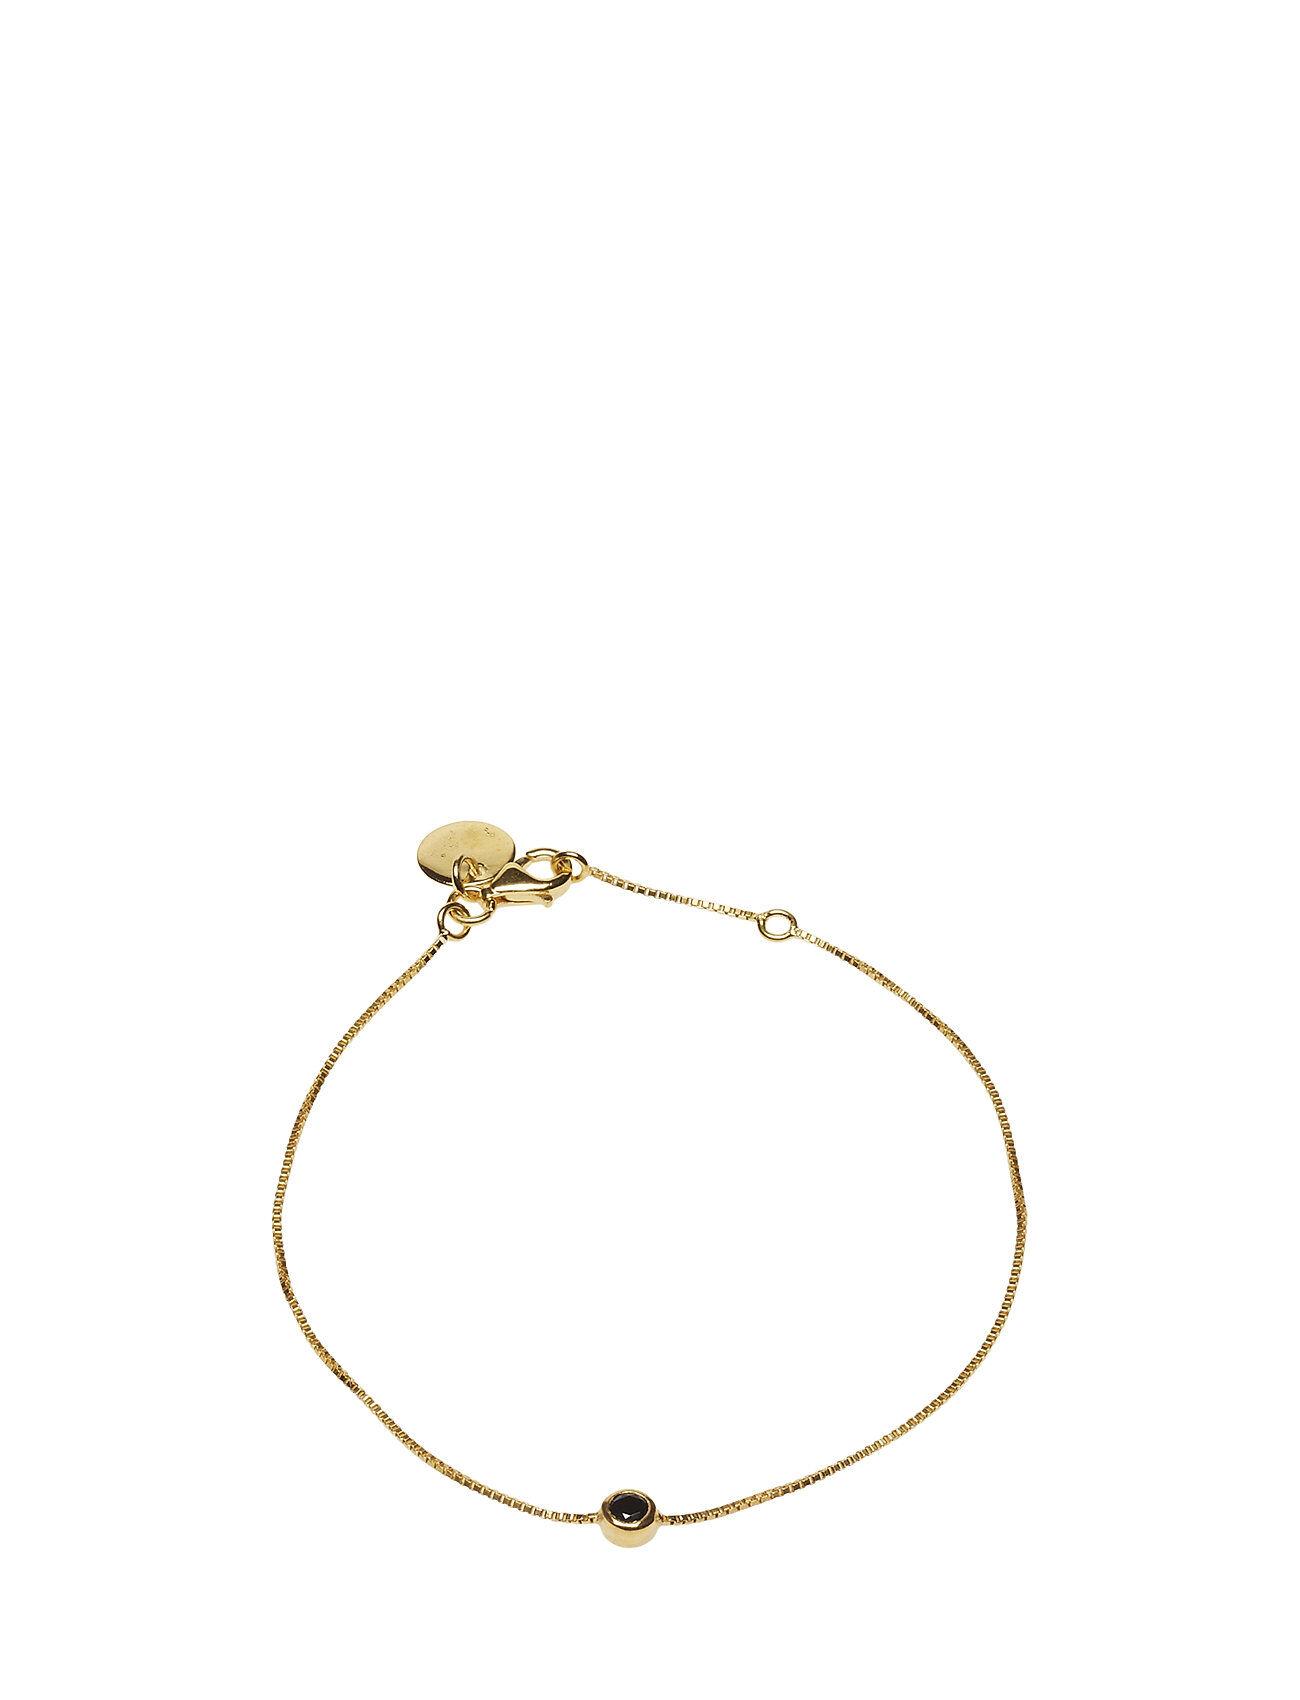 Syster P Minimalistica Solo Bracelet Gold Black Spinel Accessories Jewellery Bracelets Chain Bracelets Kulta Syster P